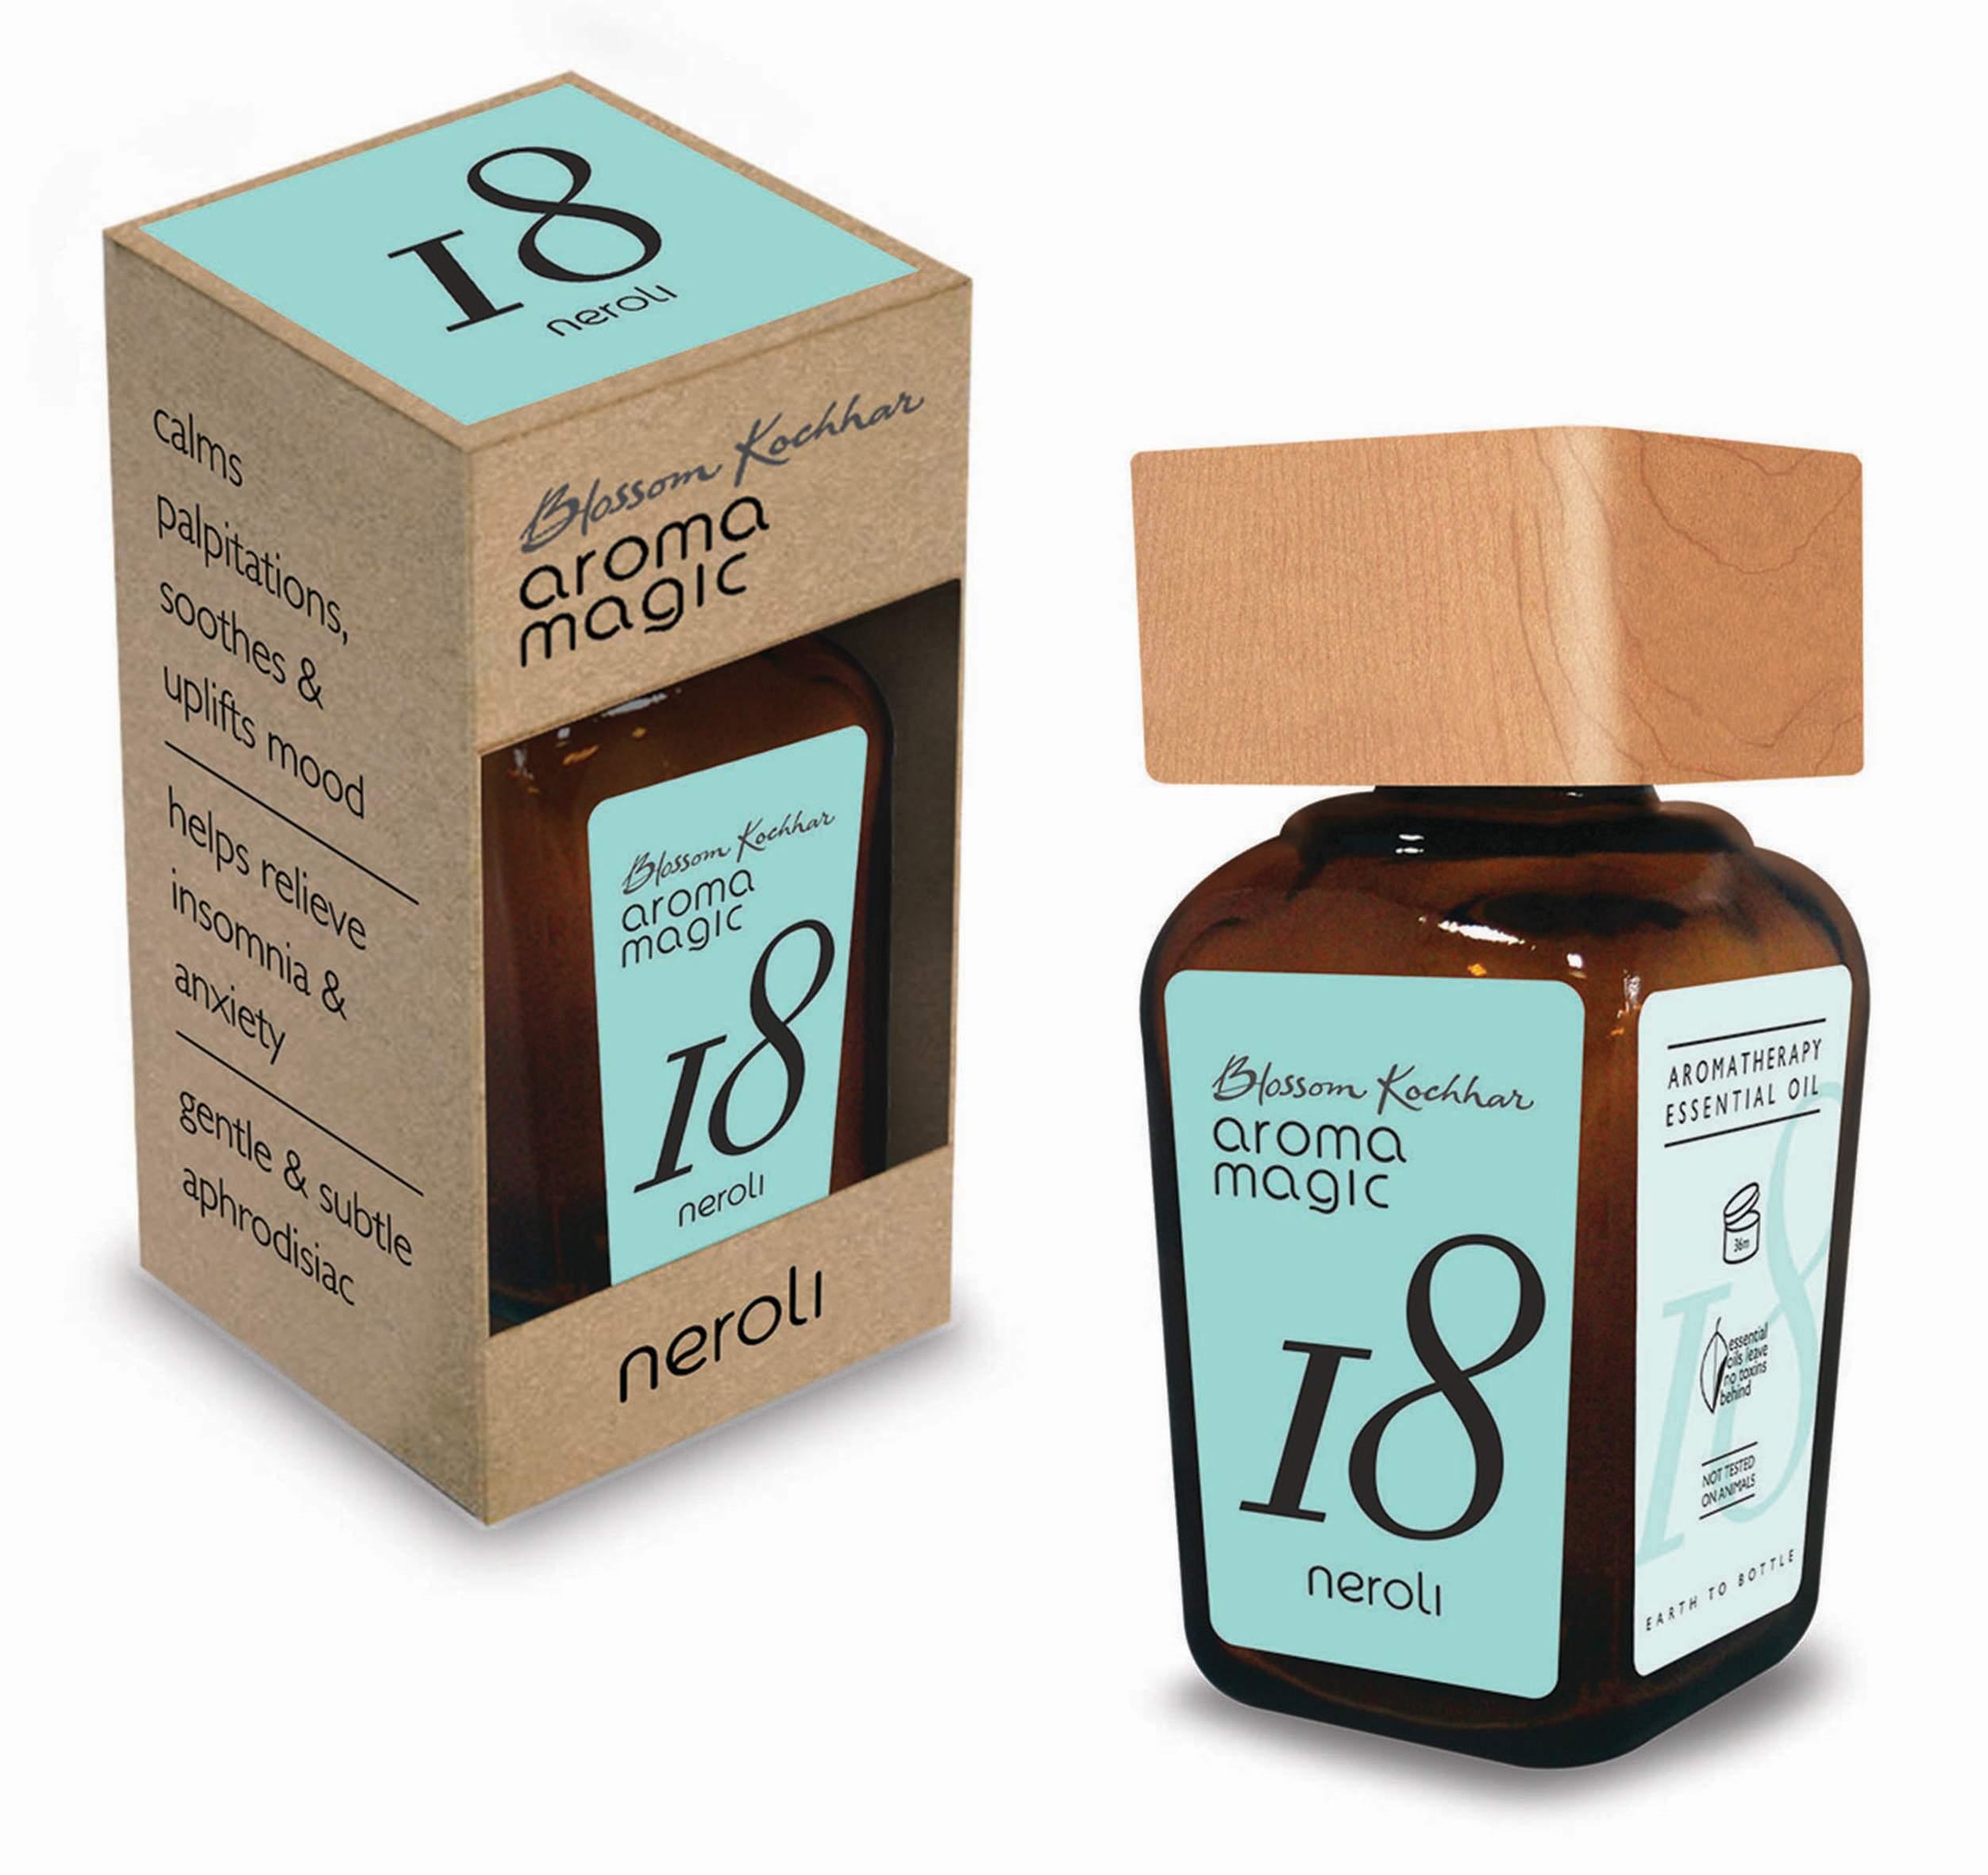 Blossom Kochhar Aroma Magic Neroli Oil